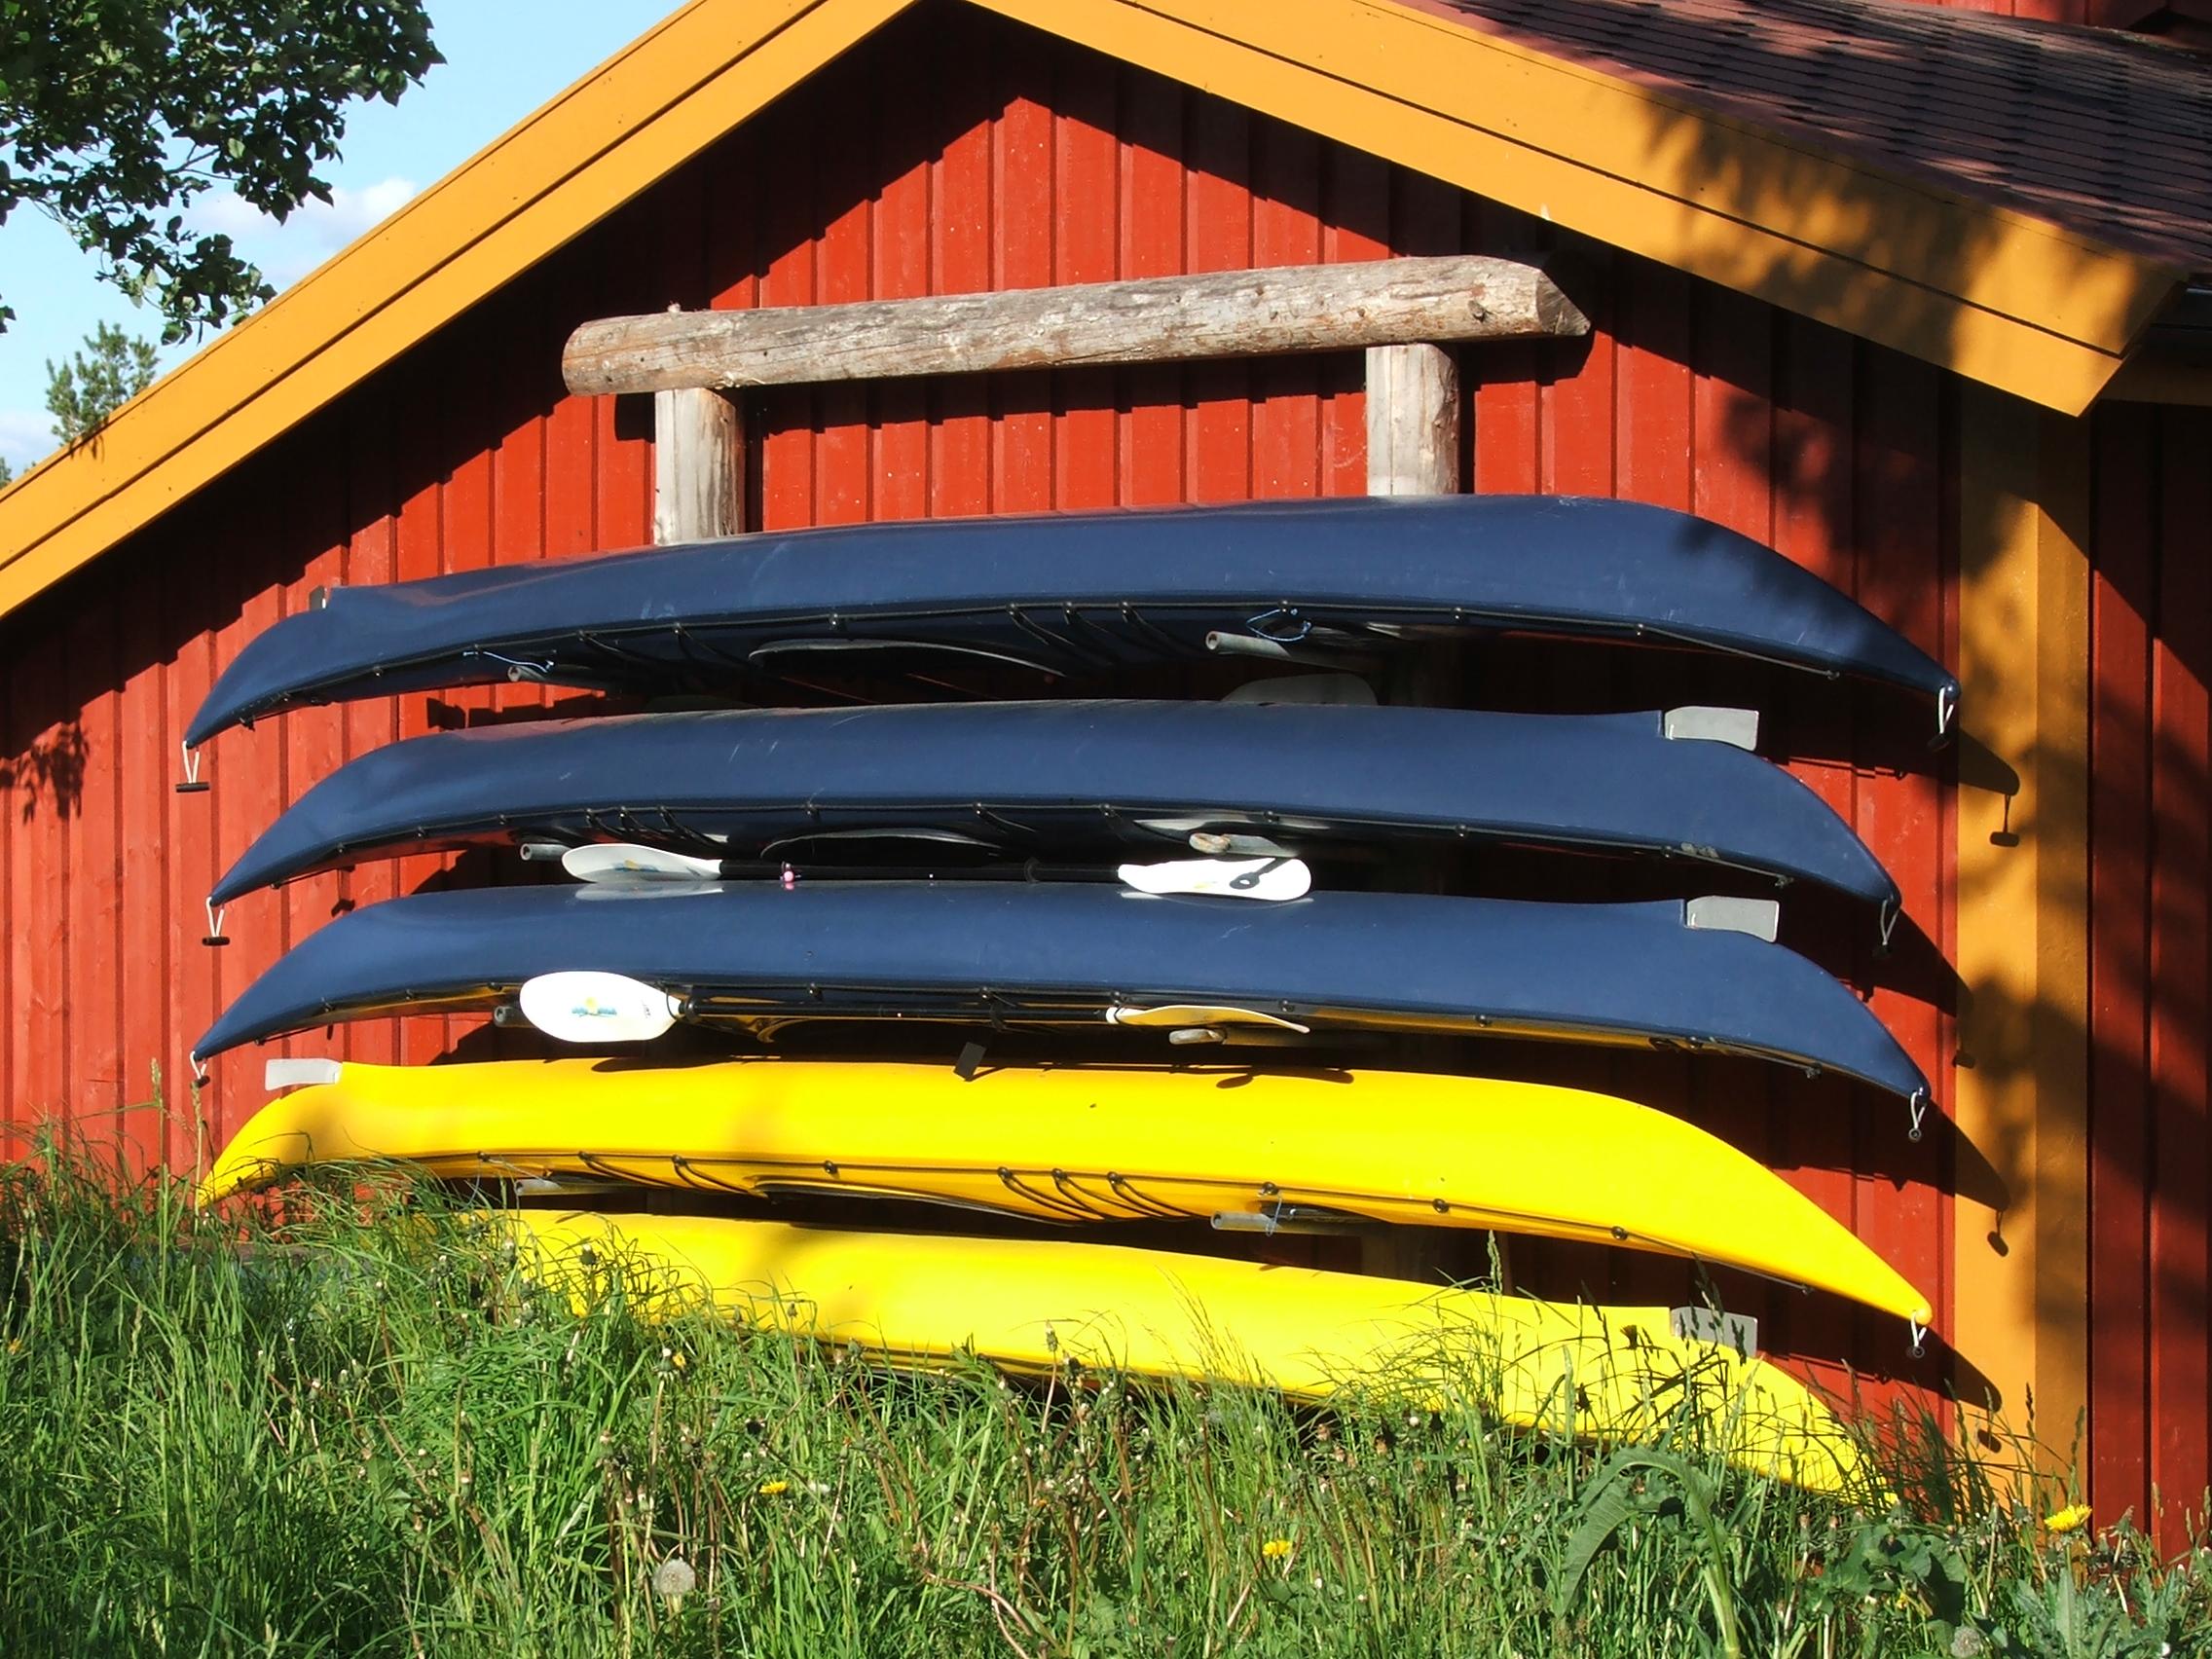 Lamb_Pam_Colors of Norway